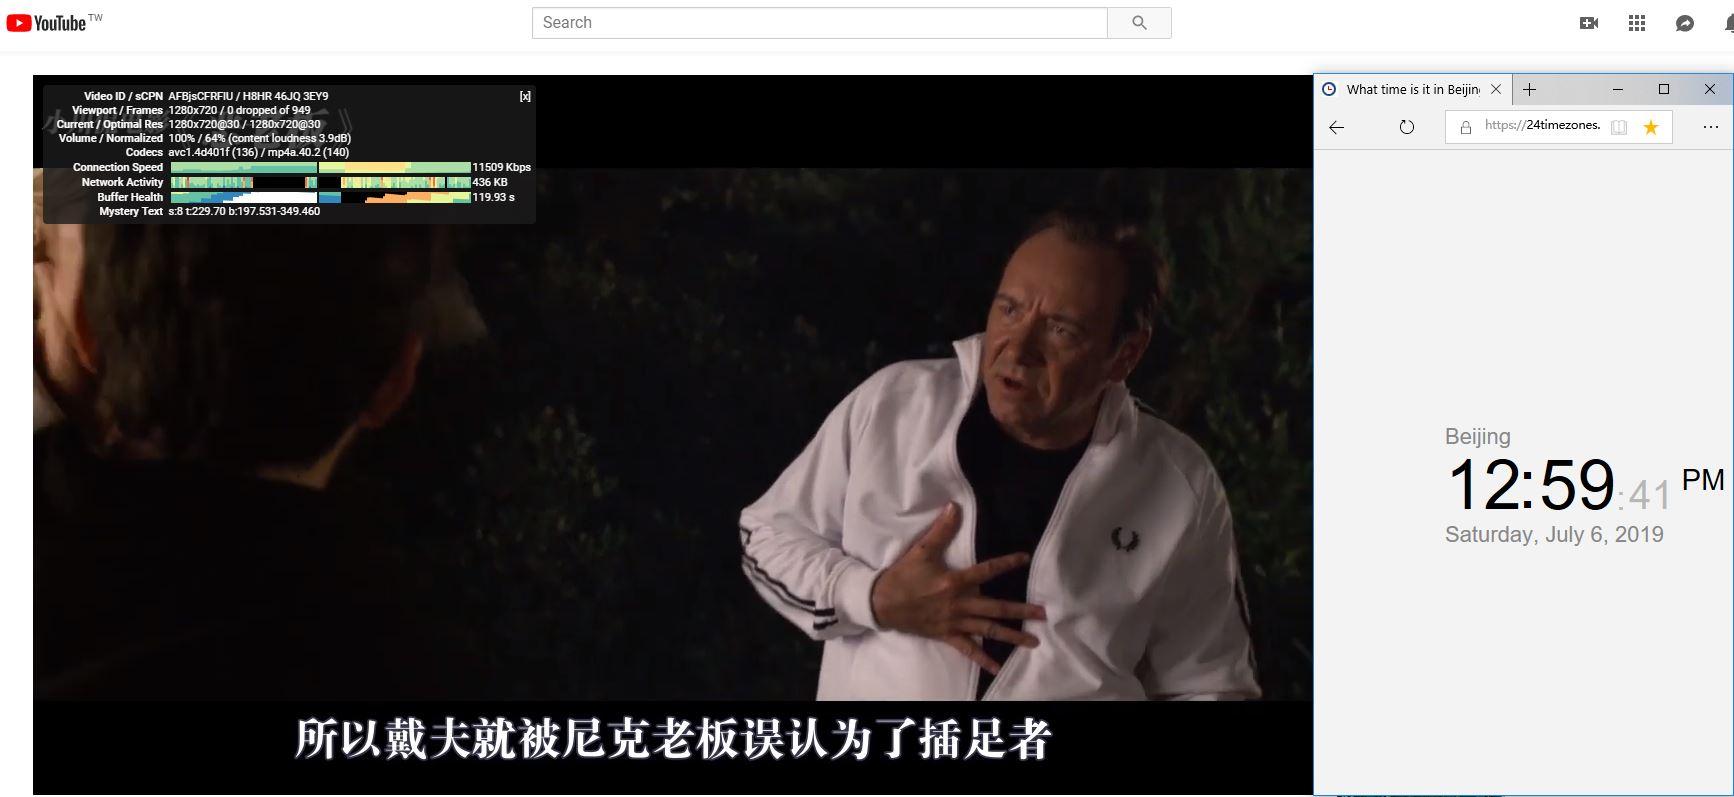 Windows Surfshark 台湾节点 翻墙科学上网测试-YouTube-20190706